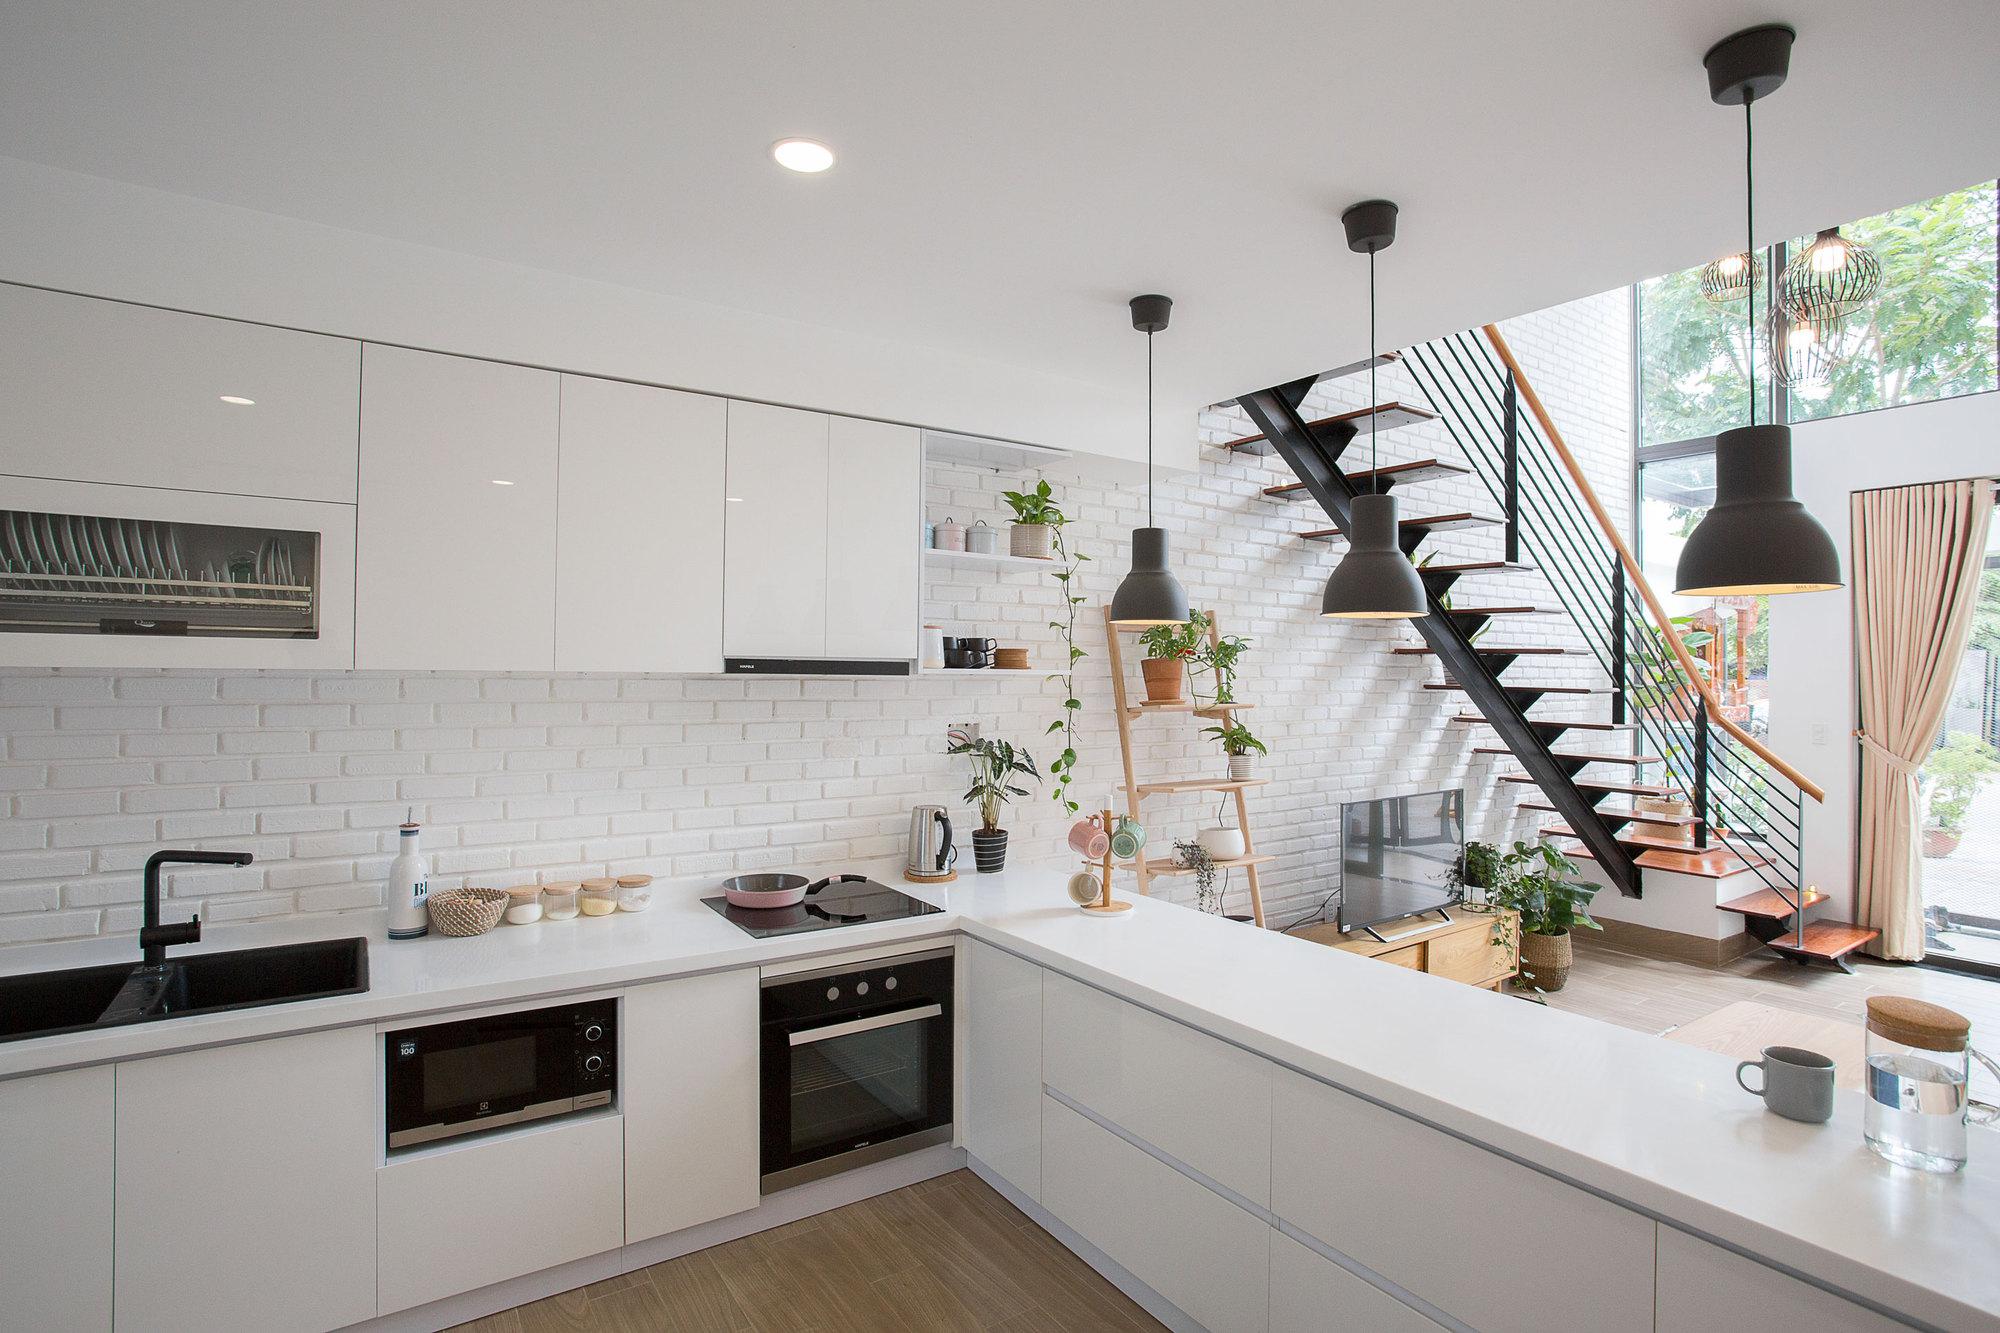 Galeria de casa minimalista 85 design 17 for Design minimalista